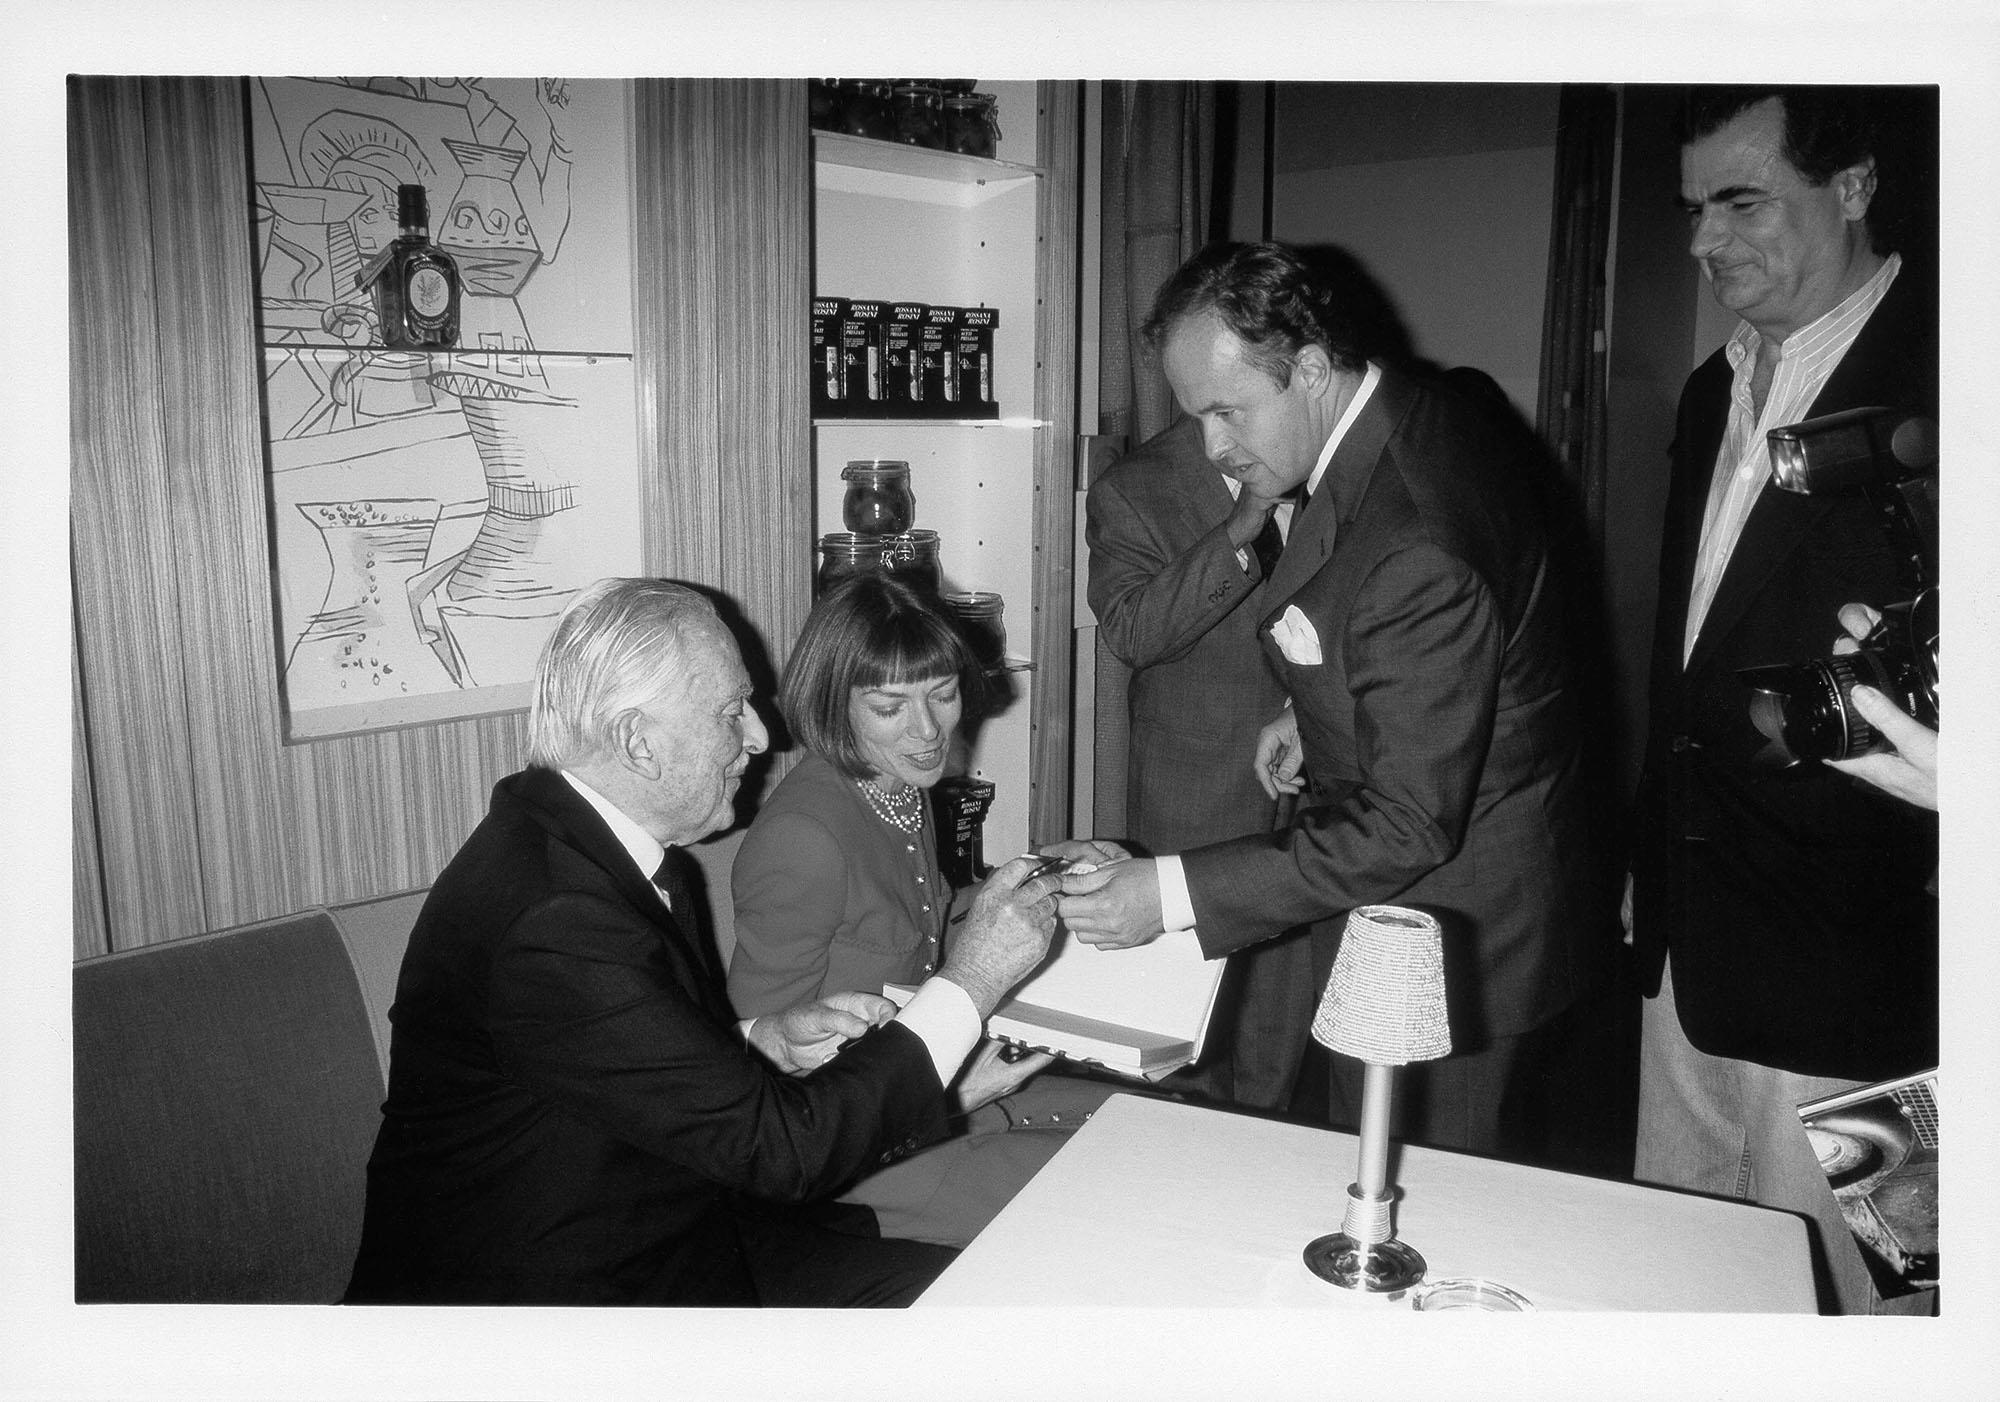 Alex Liberman, Anna Wintour, Charles Churchward, Patrick Demarchier, NYC 1994.